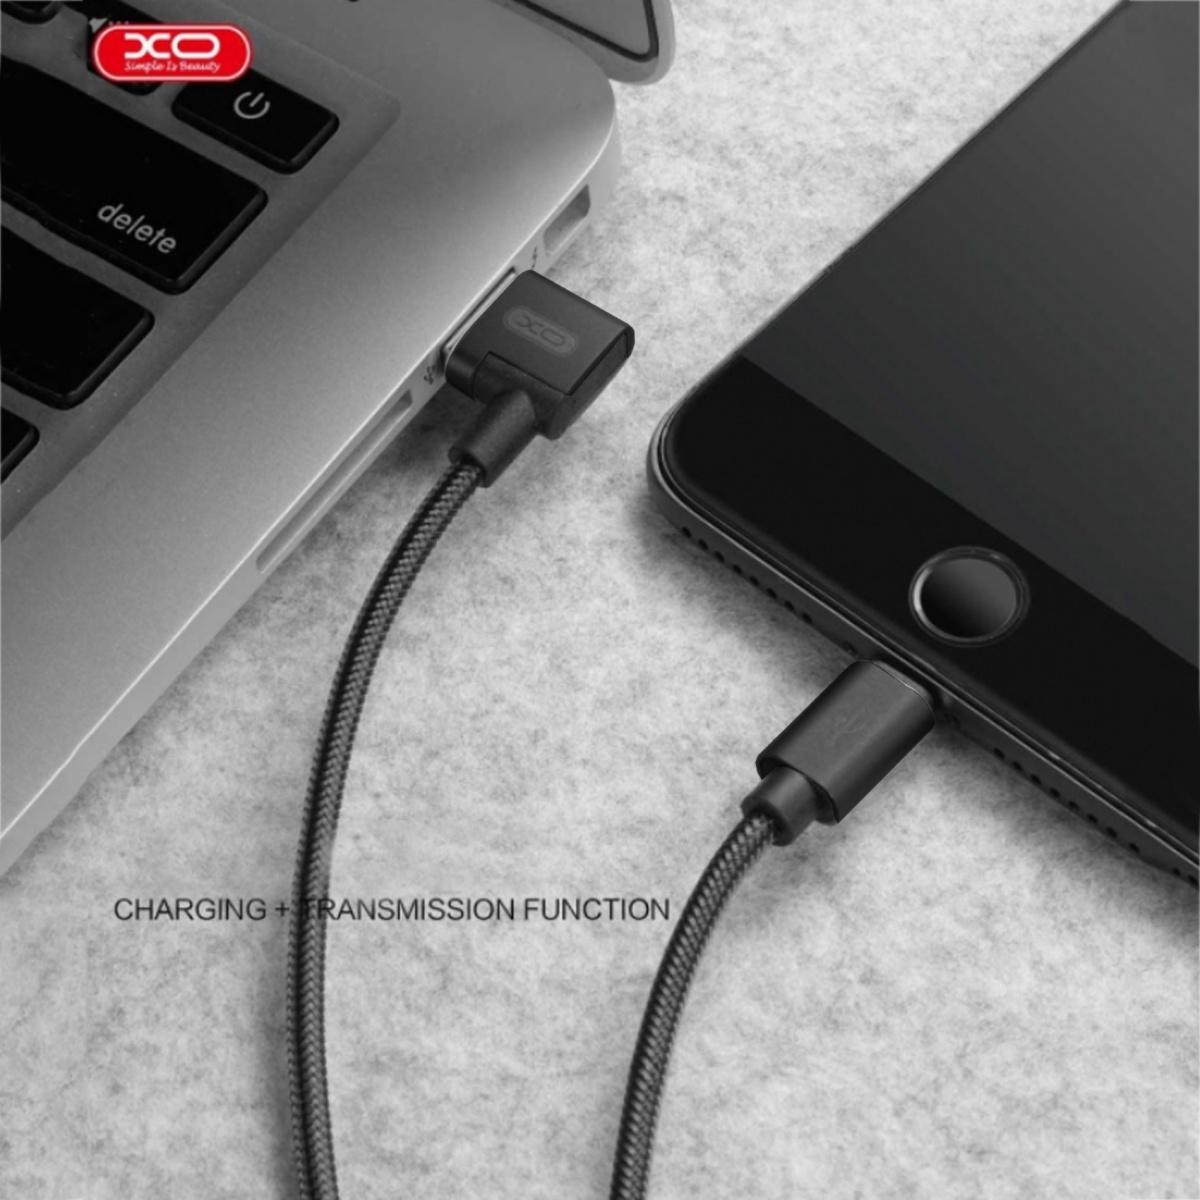 XO NB31 Type C USB Elbow Alloy 2.4A Cable - Black